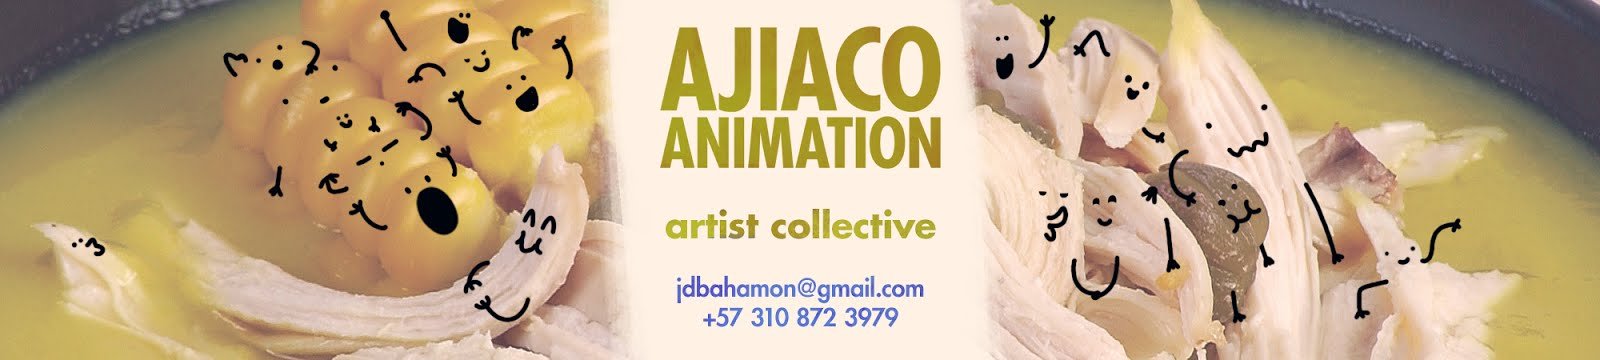 AJIACO ANIMATION